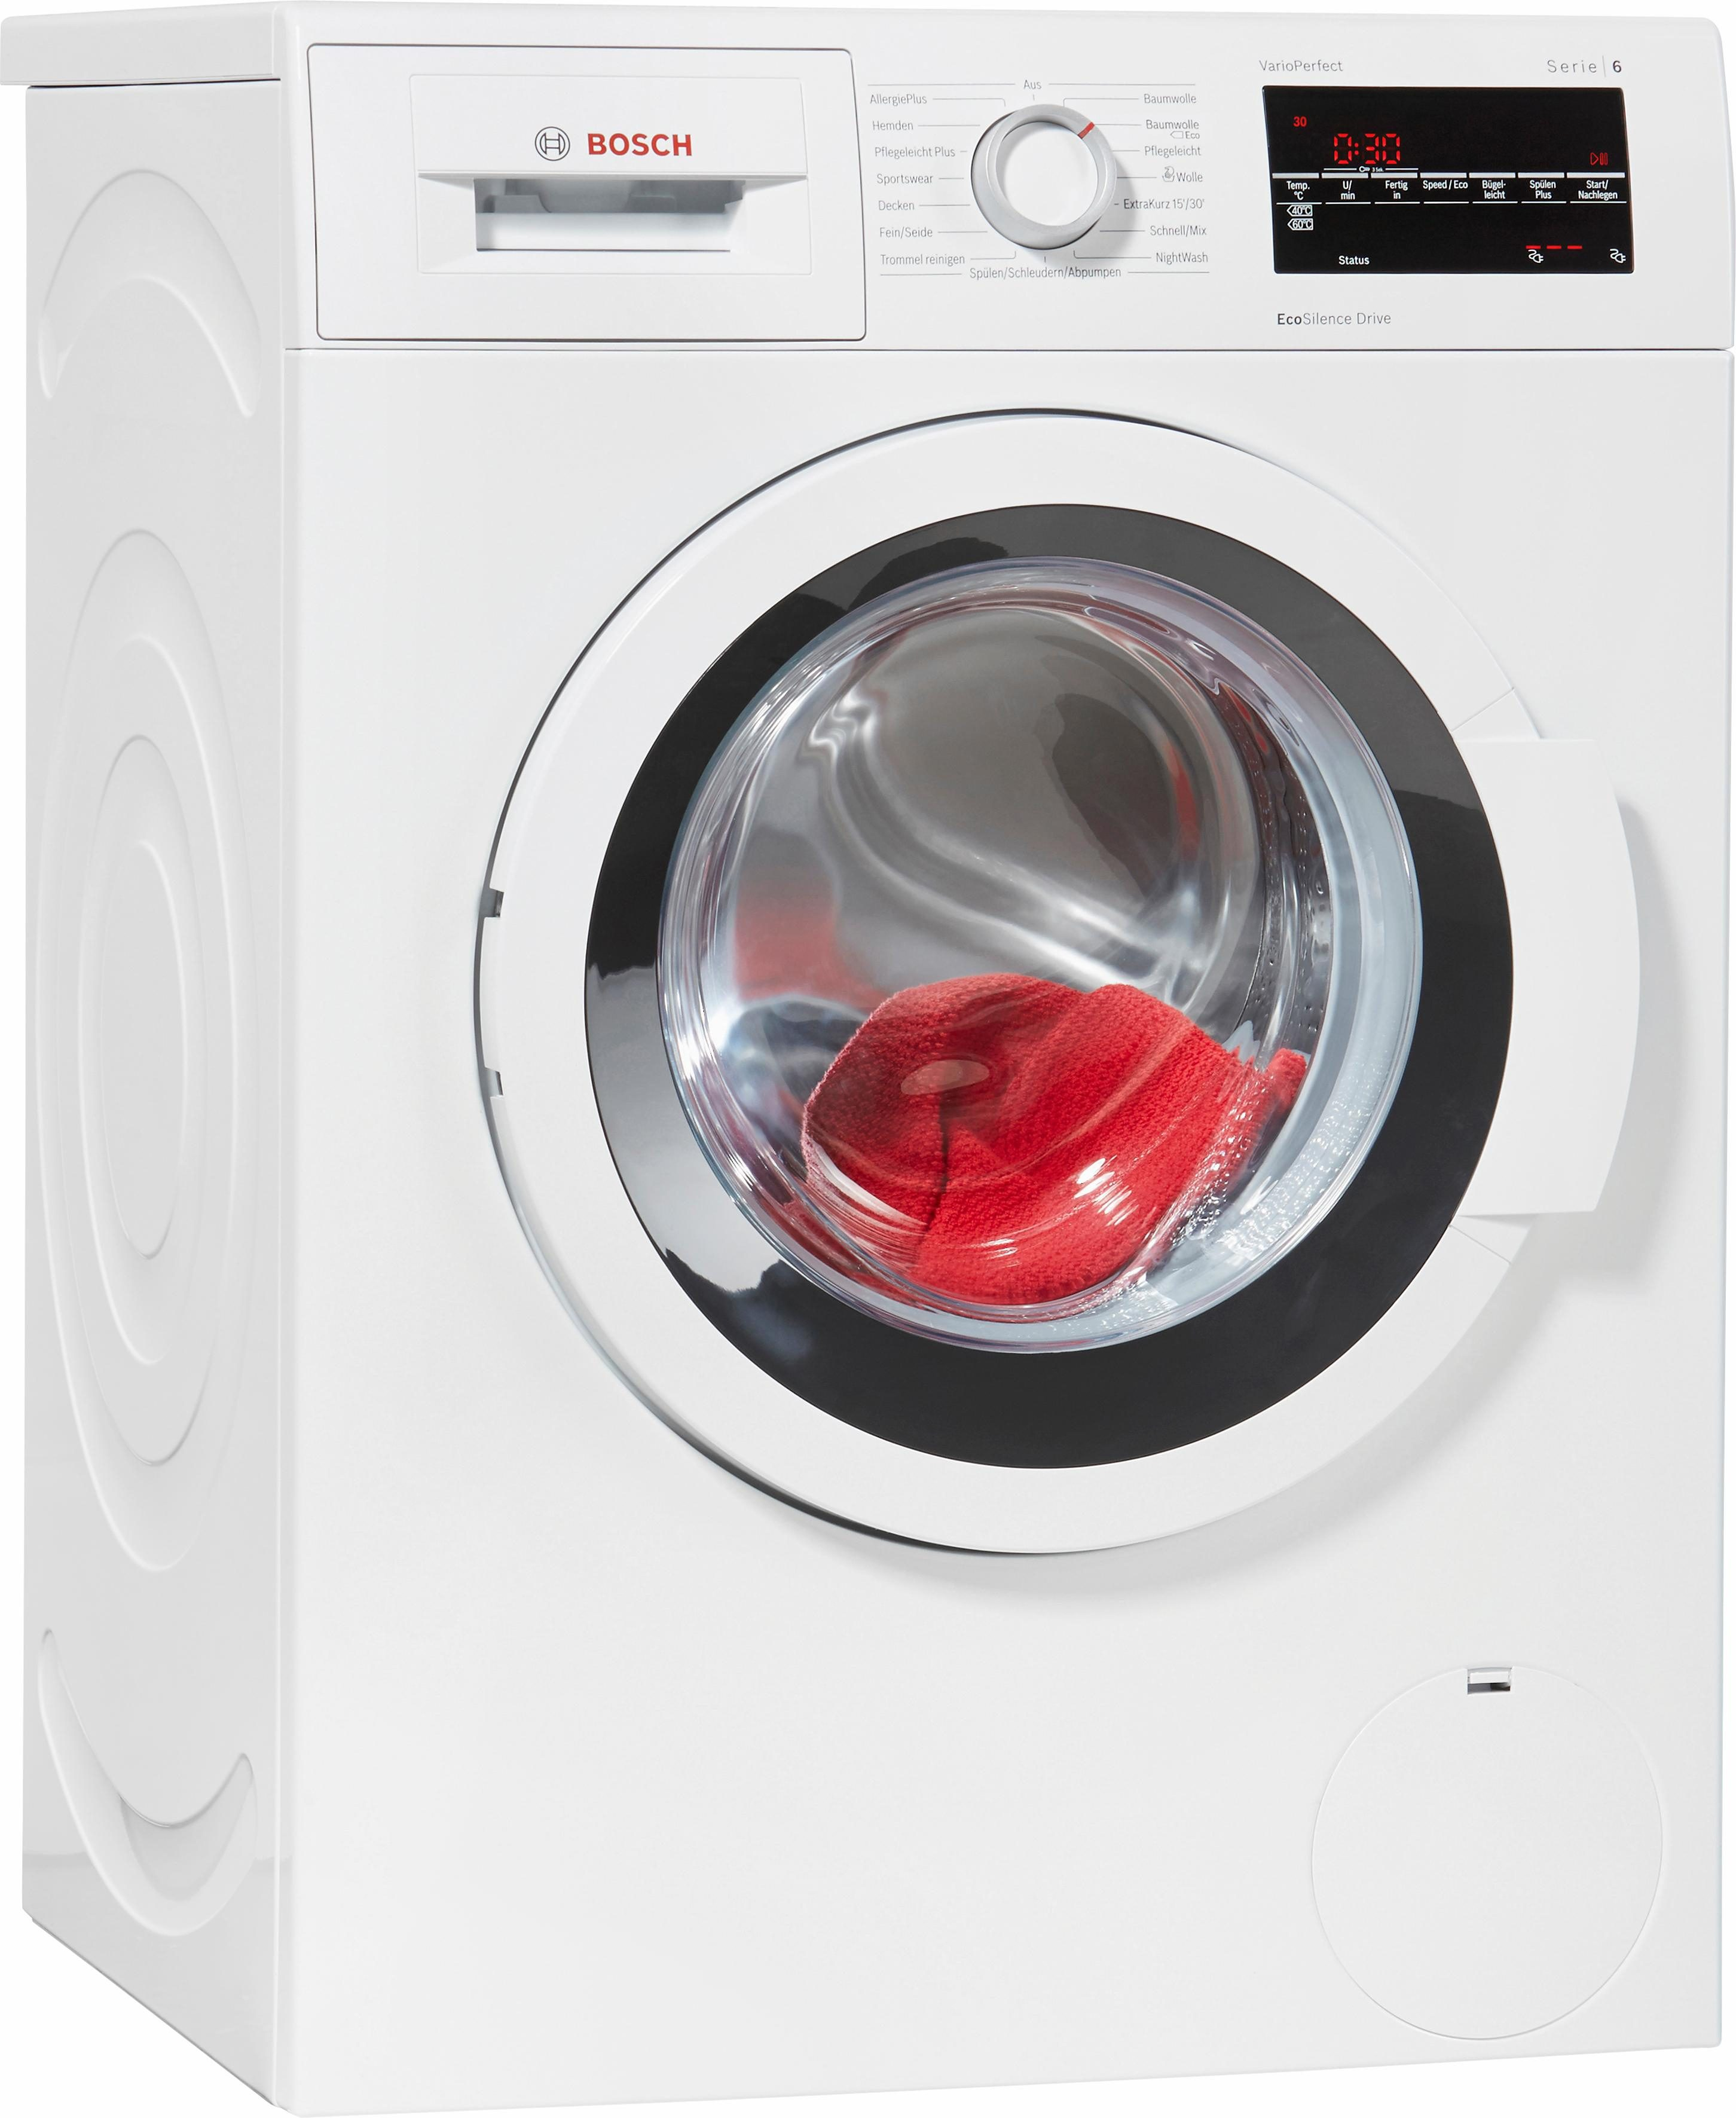 BOSCH Waschmaschine Serie 6 WAT28420, 7 kg, 1400 U/Min